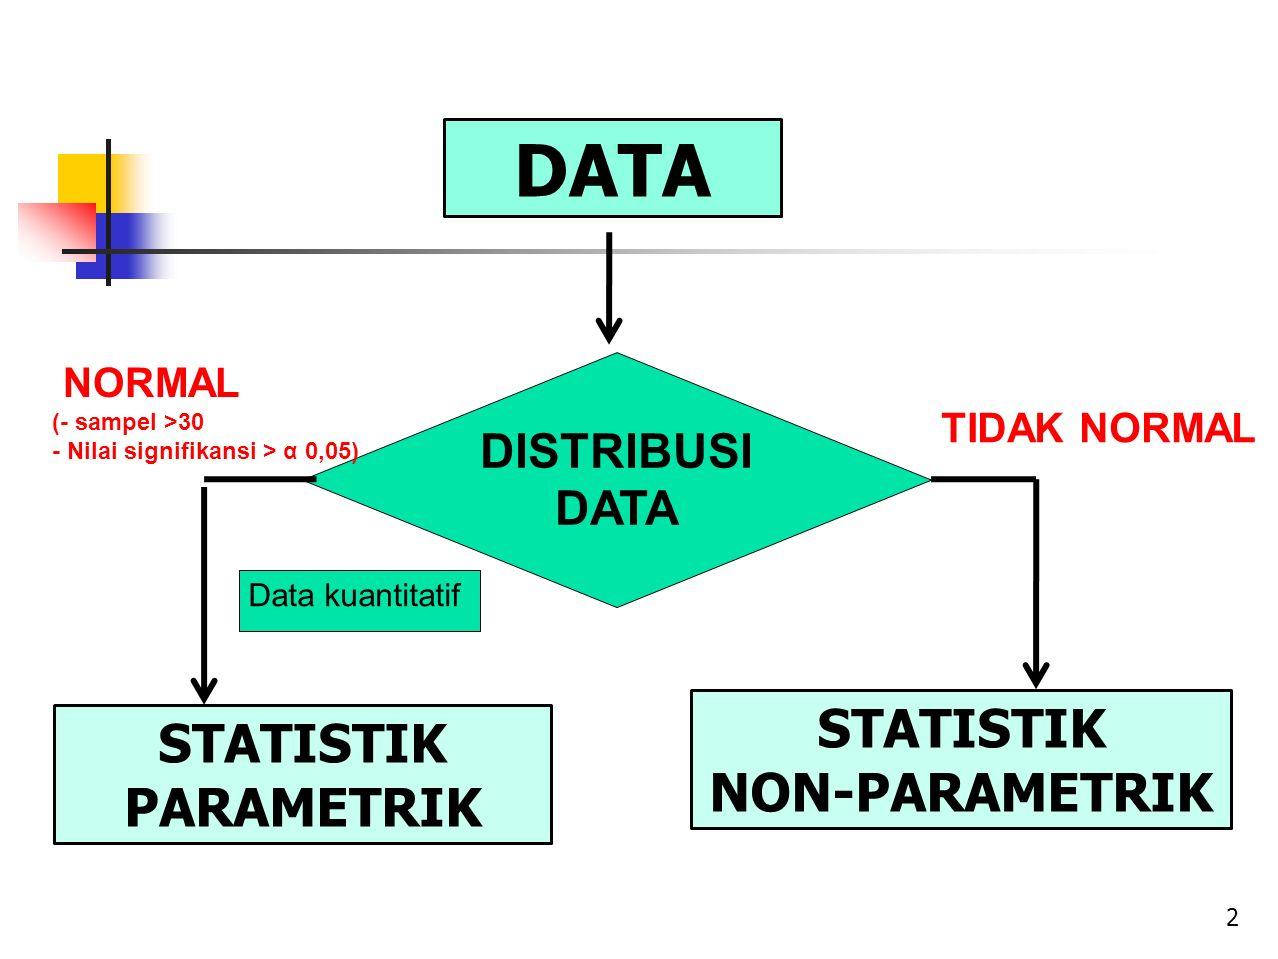 DATA STATISTIK STATISTIK NON-PARAMETRIK PARAMETRIK DISTRIBUSI DATA